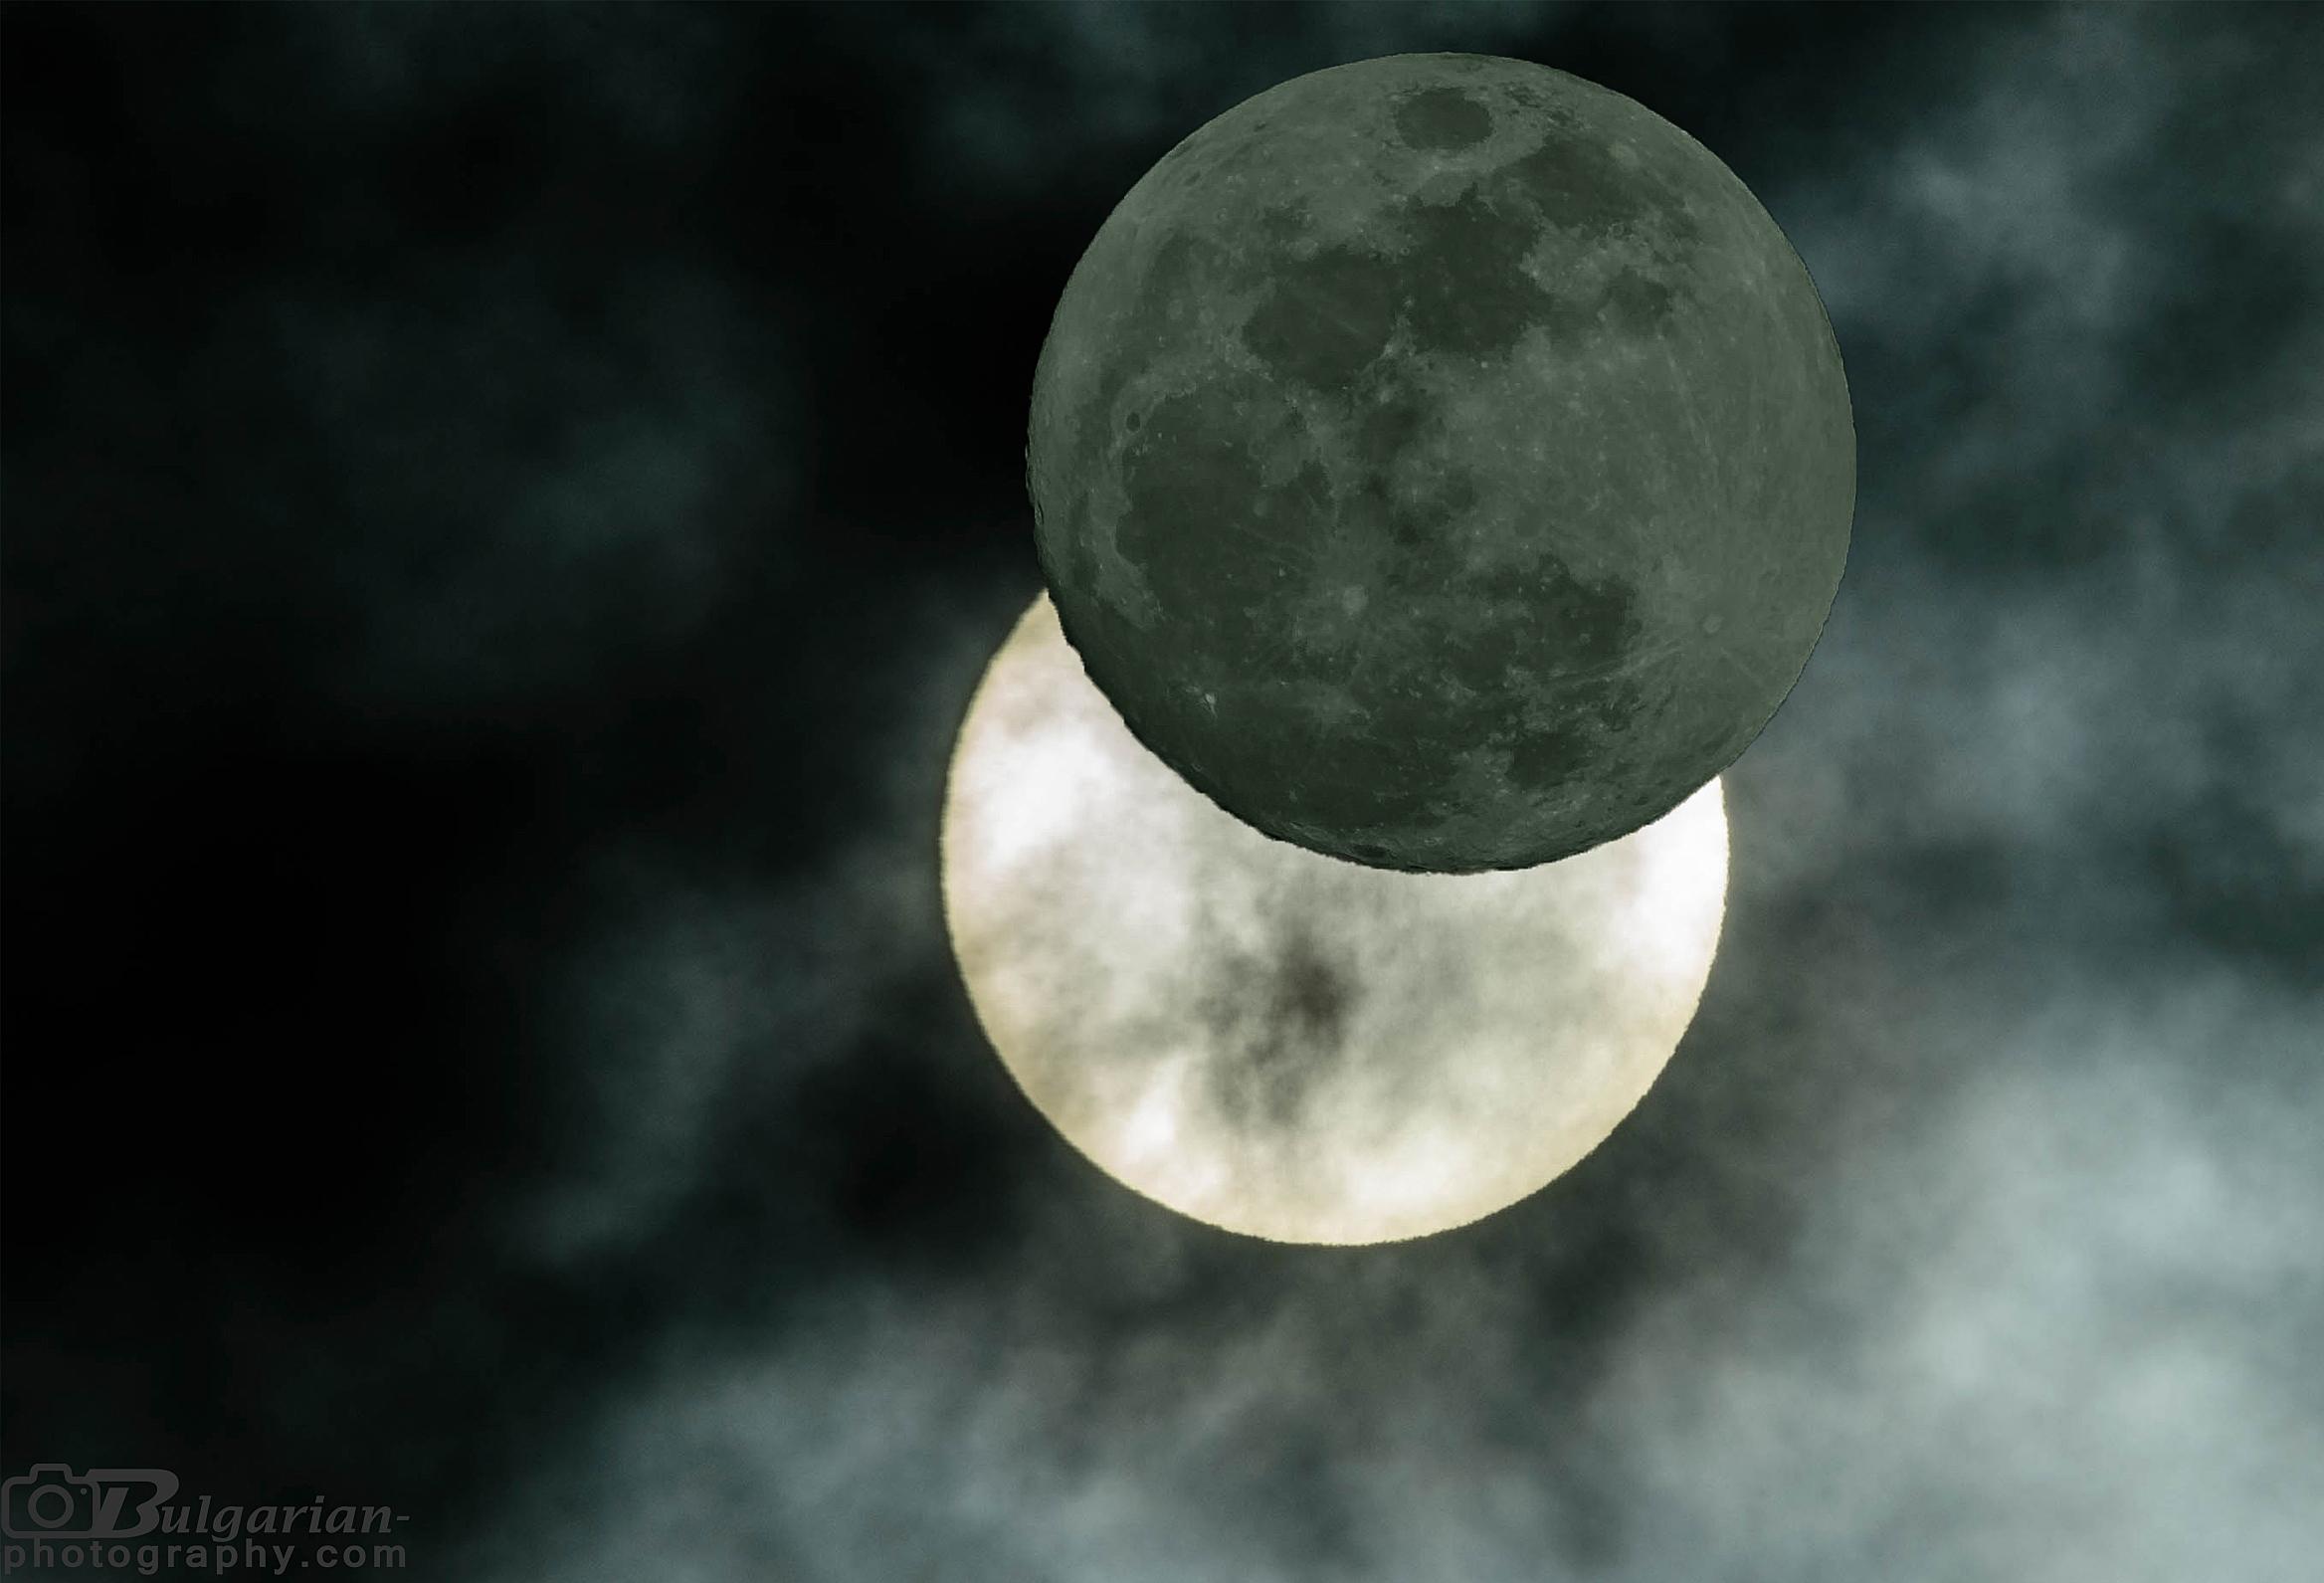 Partial solar eclipse - March 20, 2015